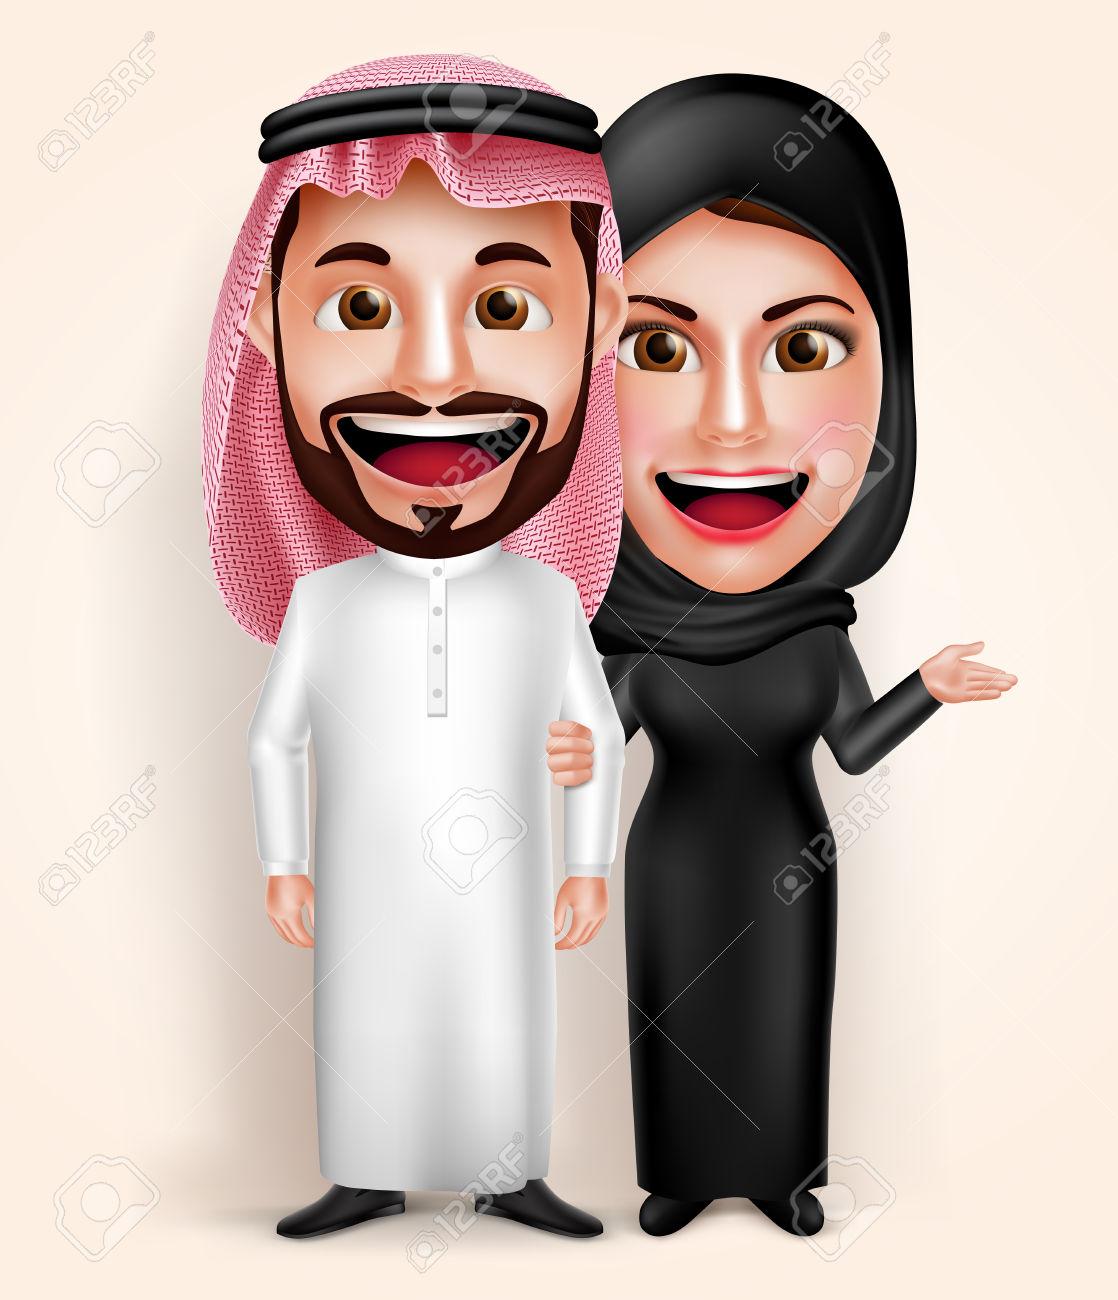 4,617 Arab Man Stock Vector Illustration And Royalty Free Arab Man.